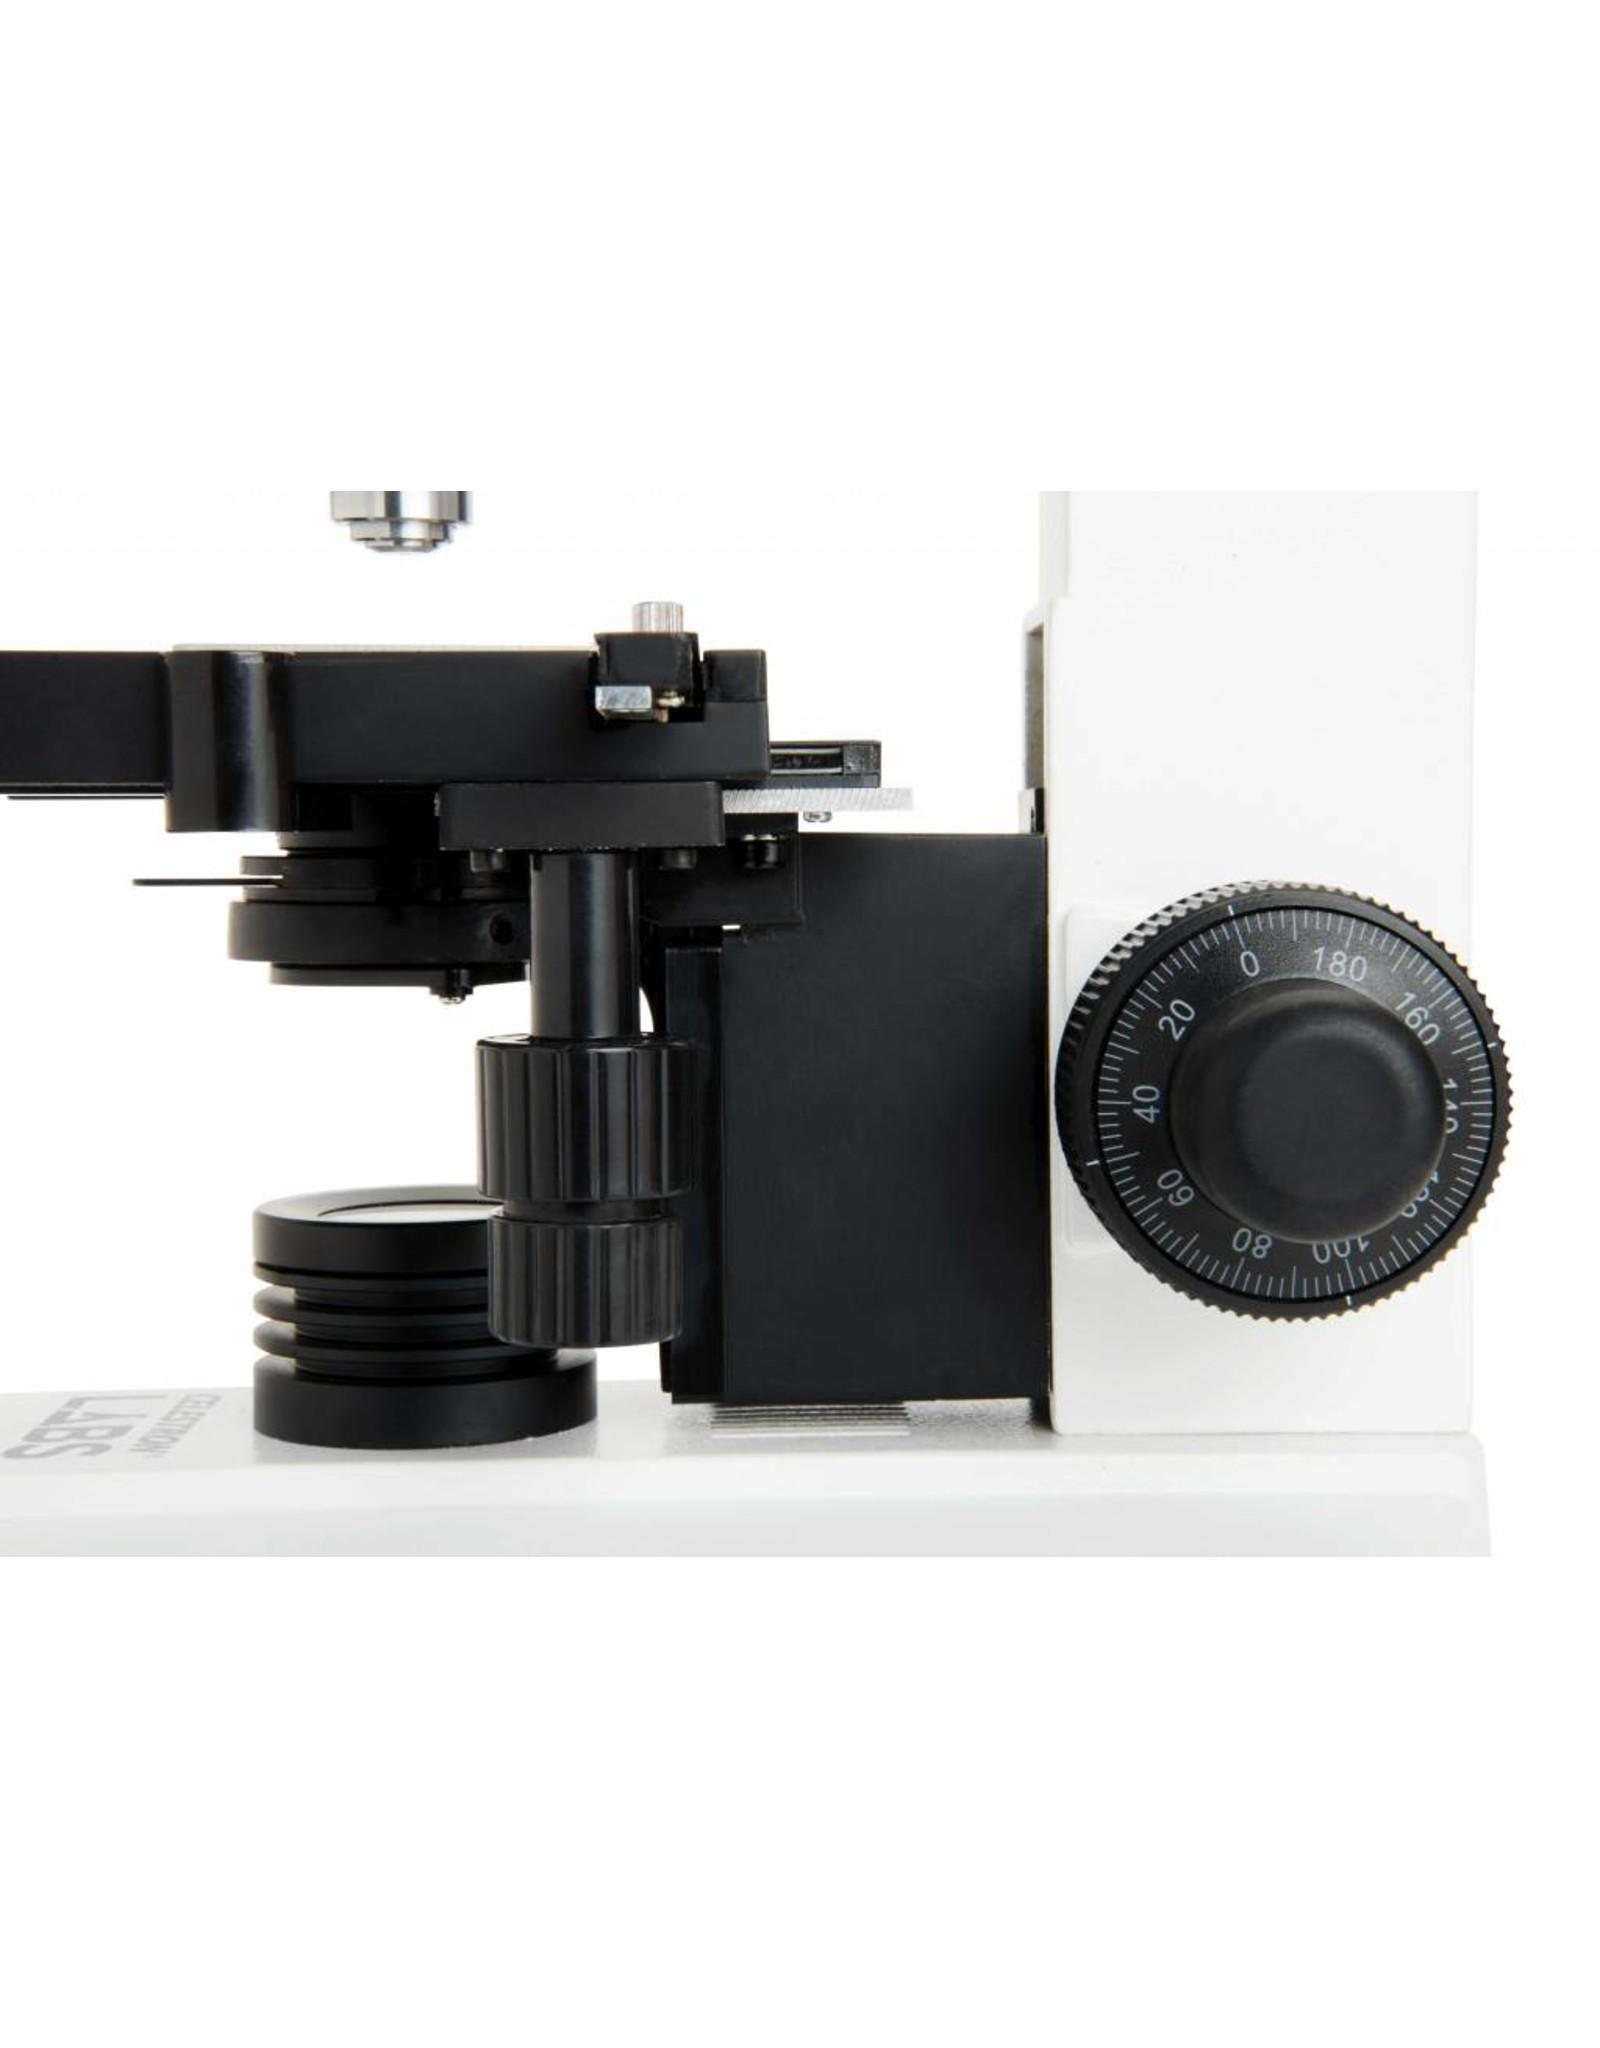 Celestron Celestron Labs CB2000C Compound Microscope